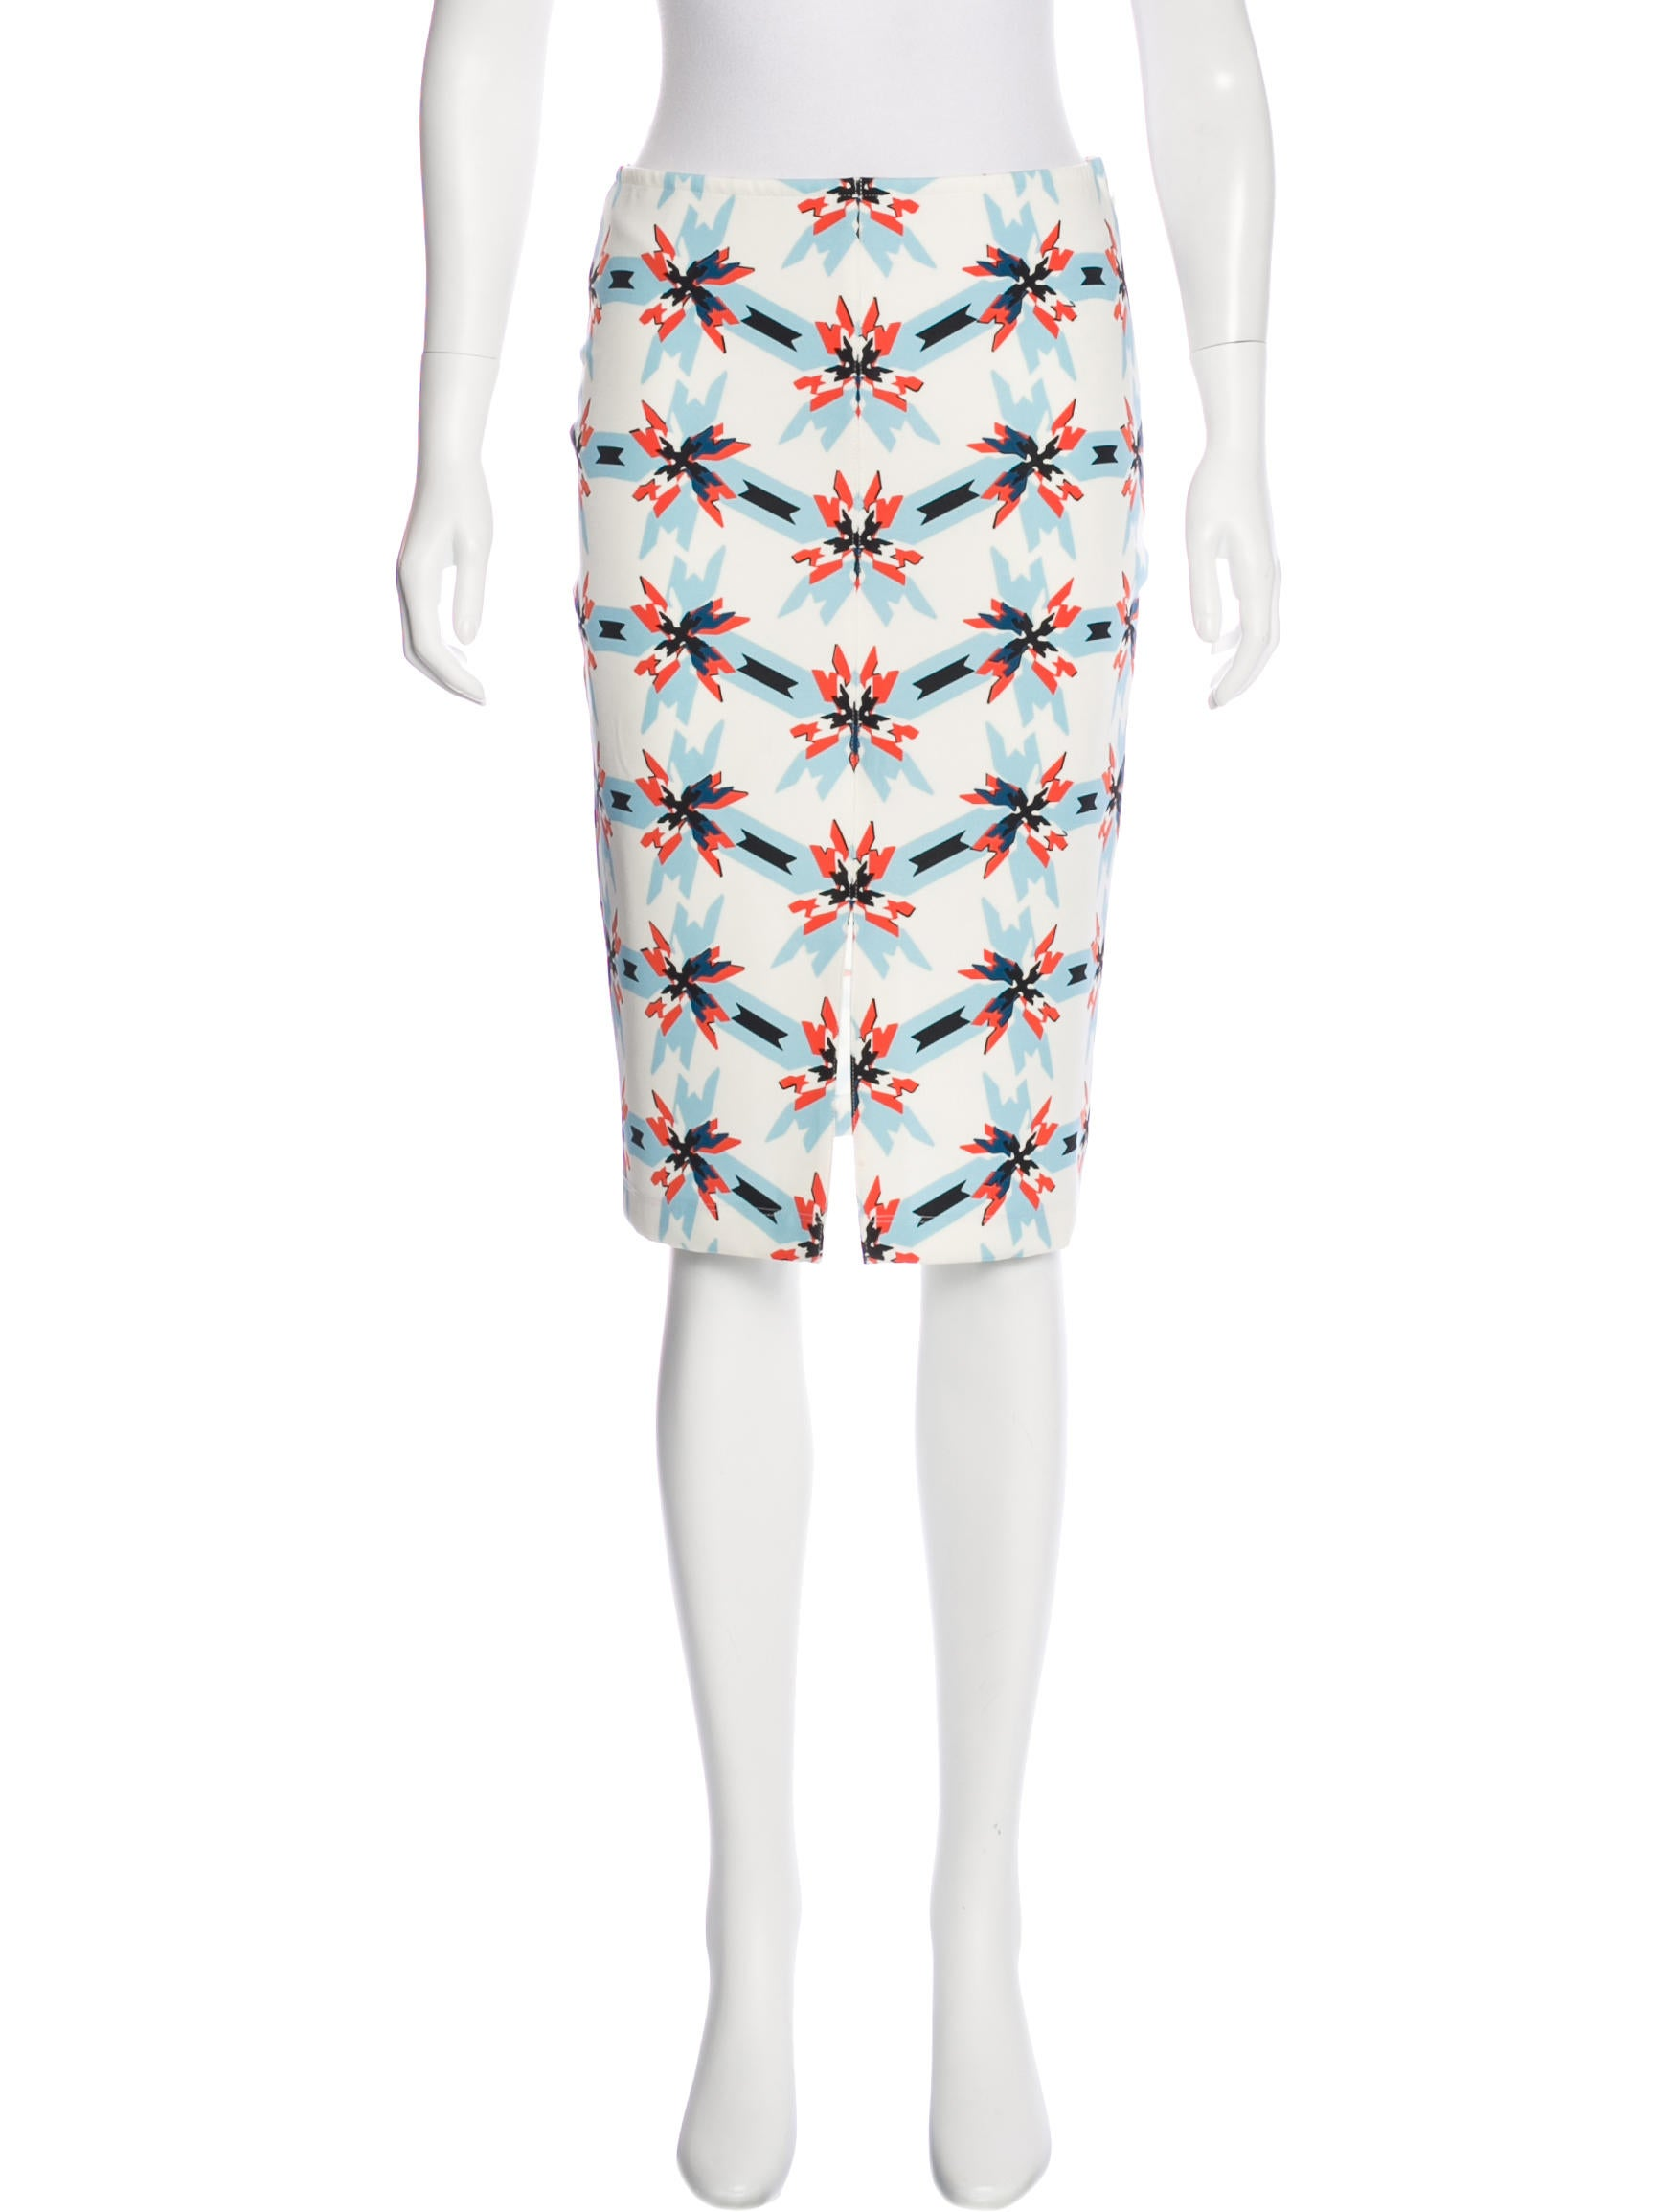 floral pencil skirt - photo #20